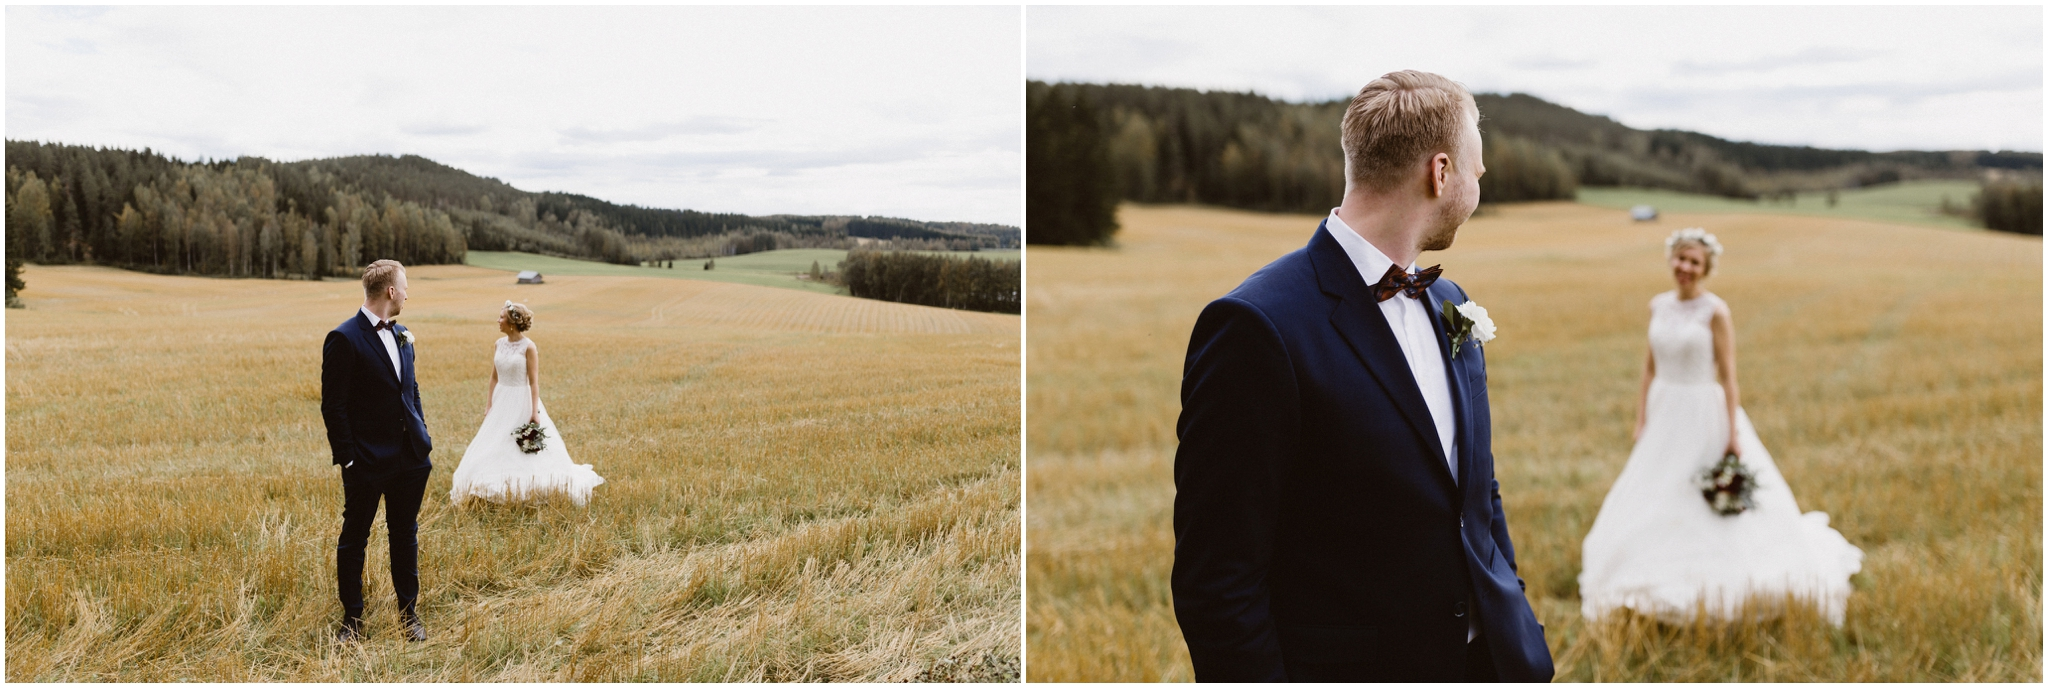 Leevi + Susanna -- Patrick Karkkolainen Wedding Photographer + Adventurer-132.jpg